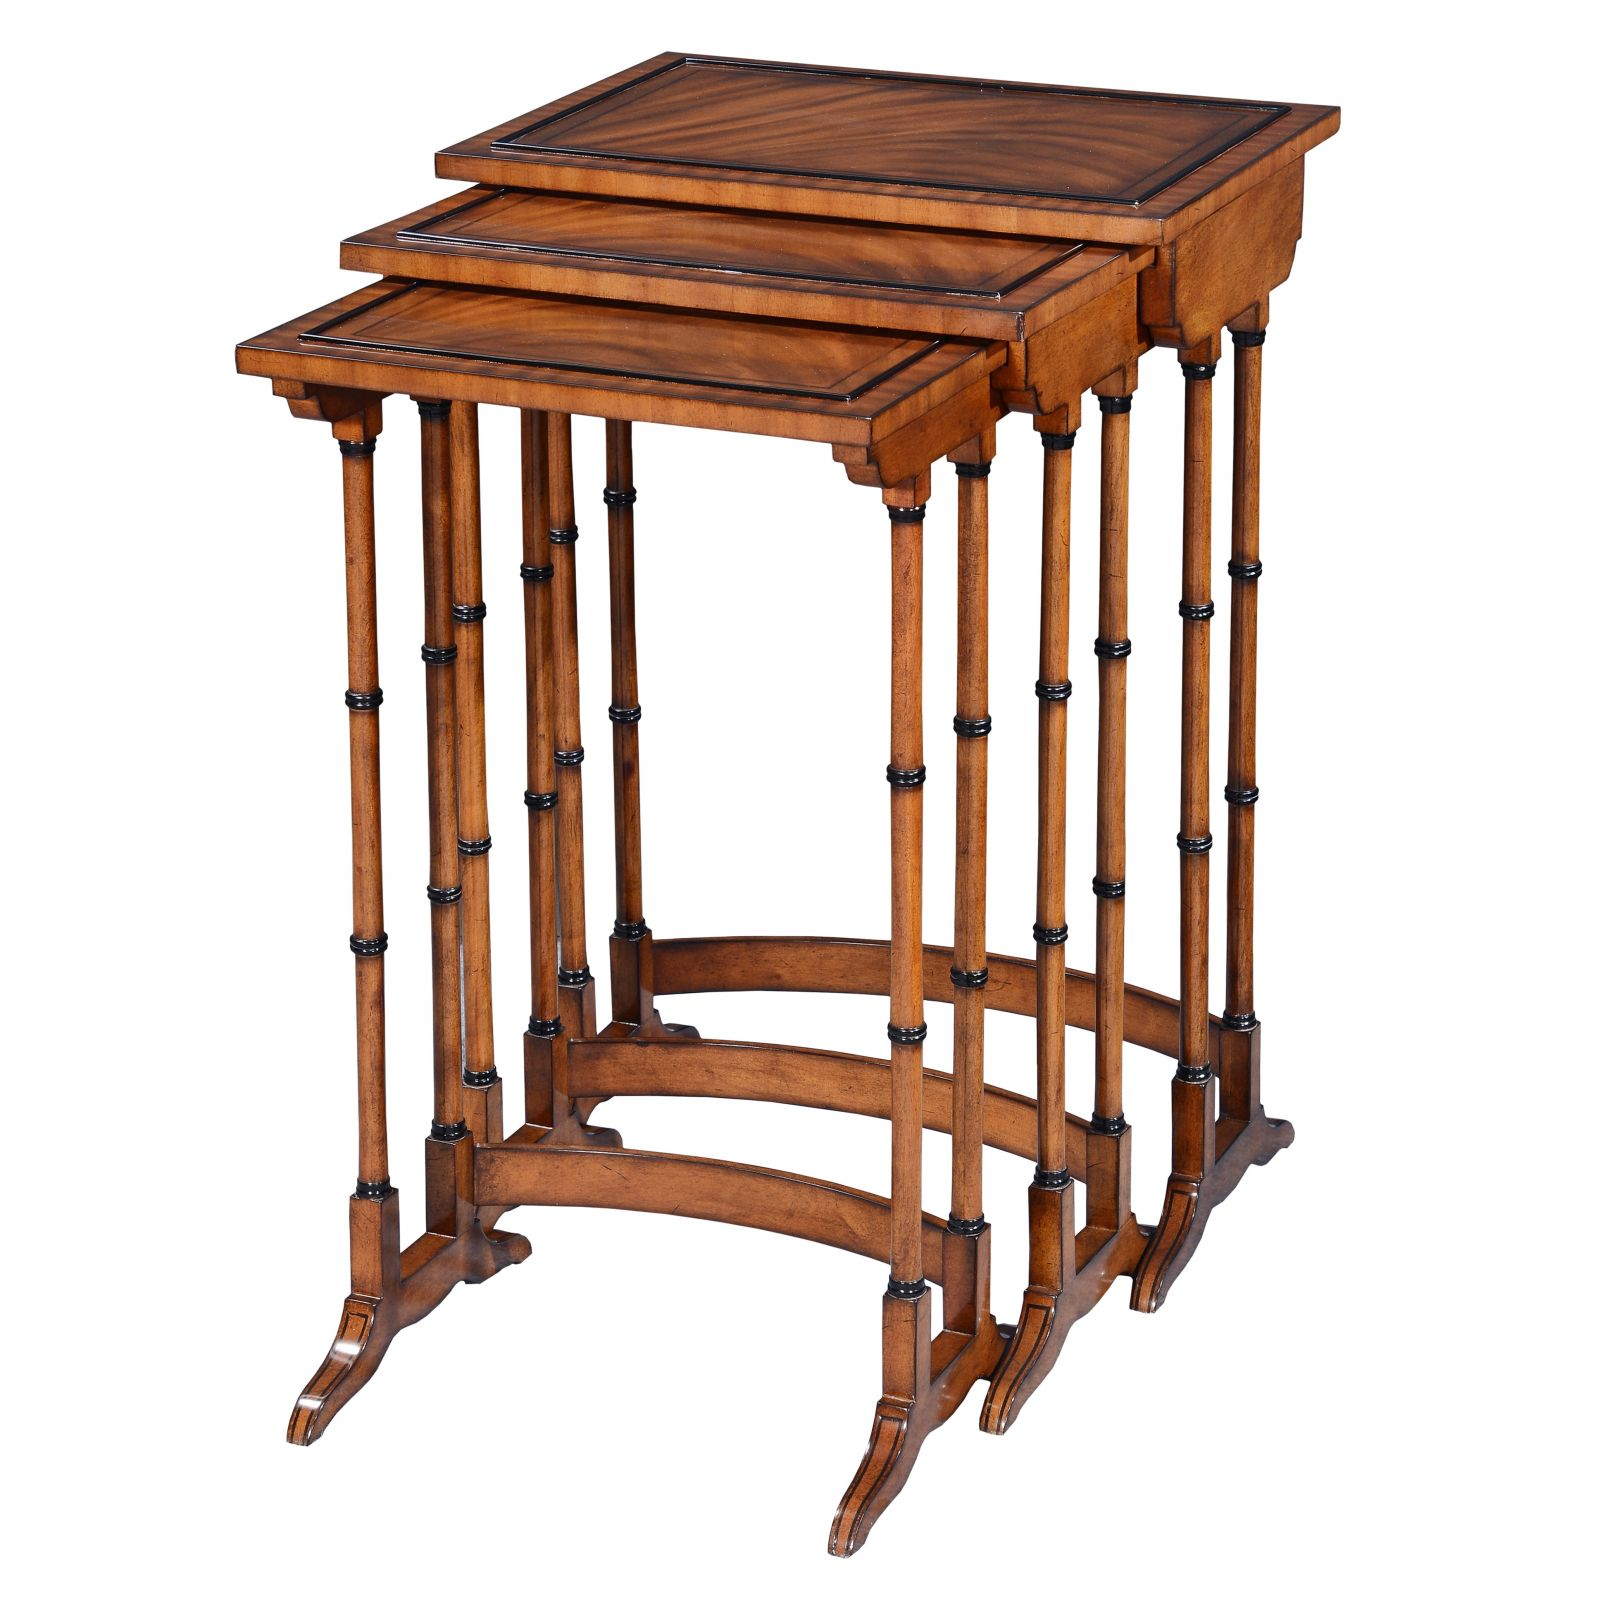 Antique style Nest of three tables - Mahogany